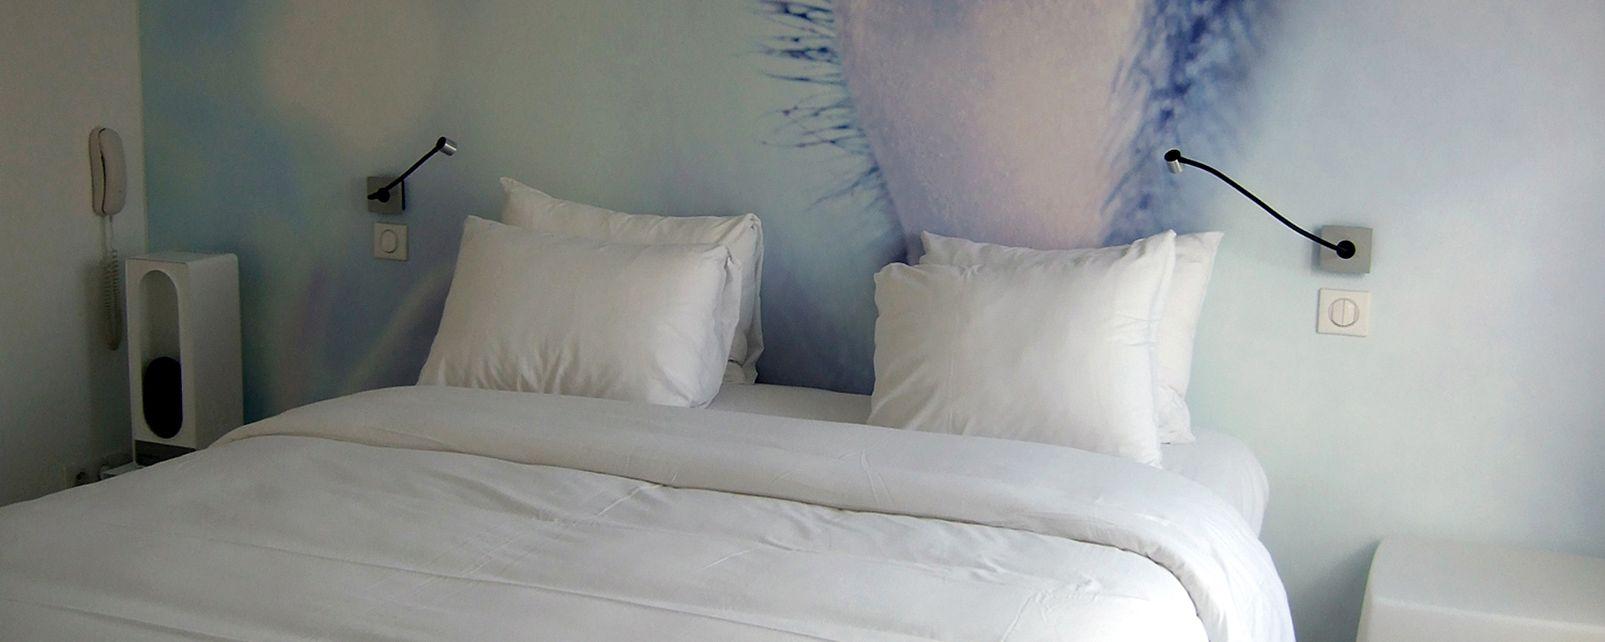 Hotel blc design in paris for Blc design hotel booking